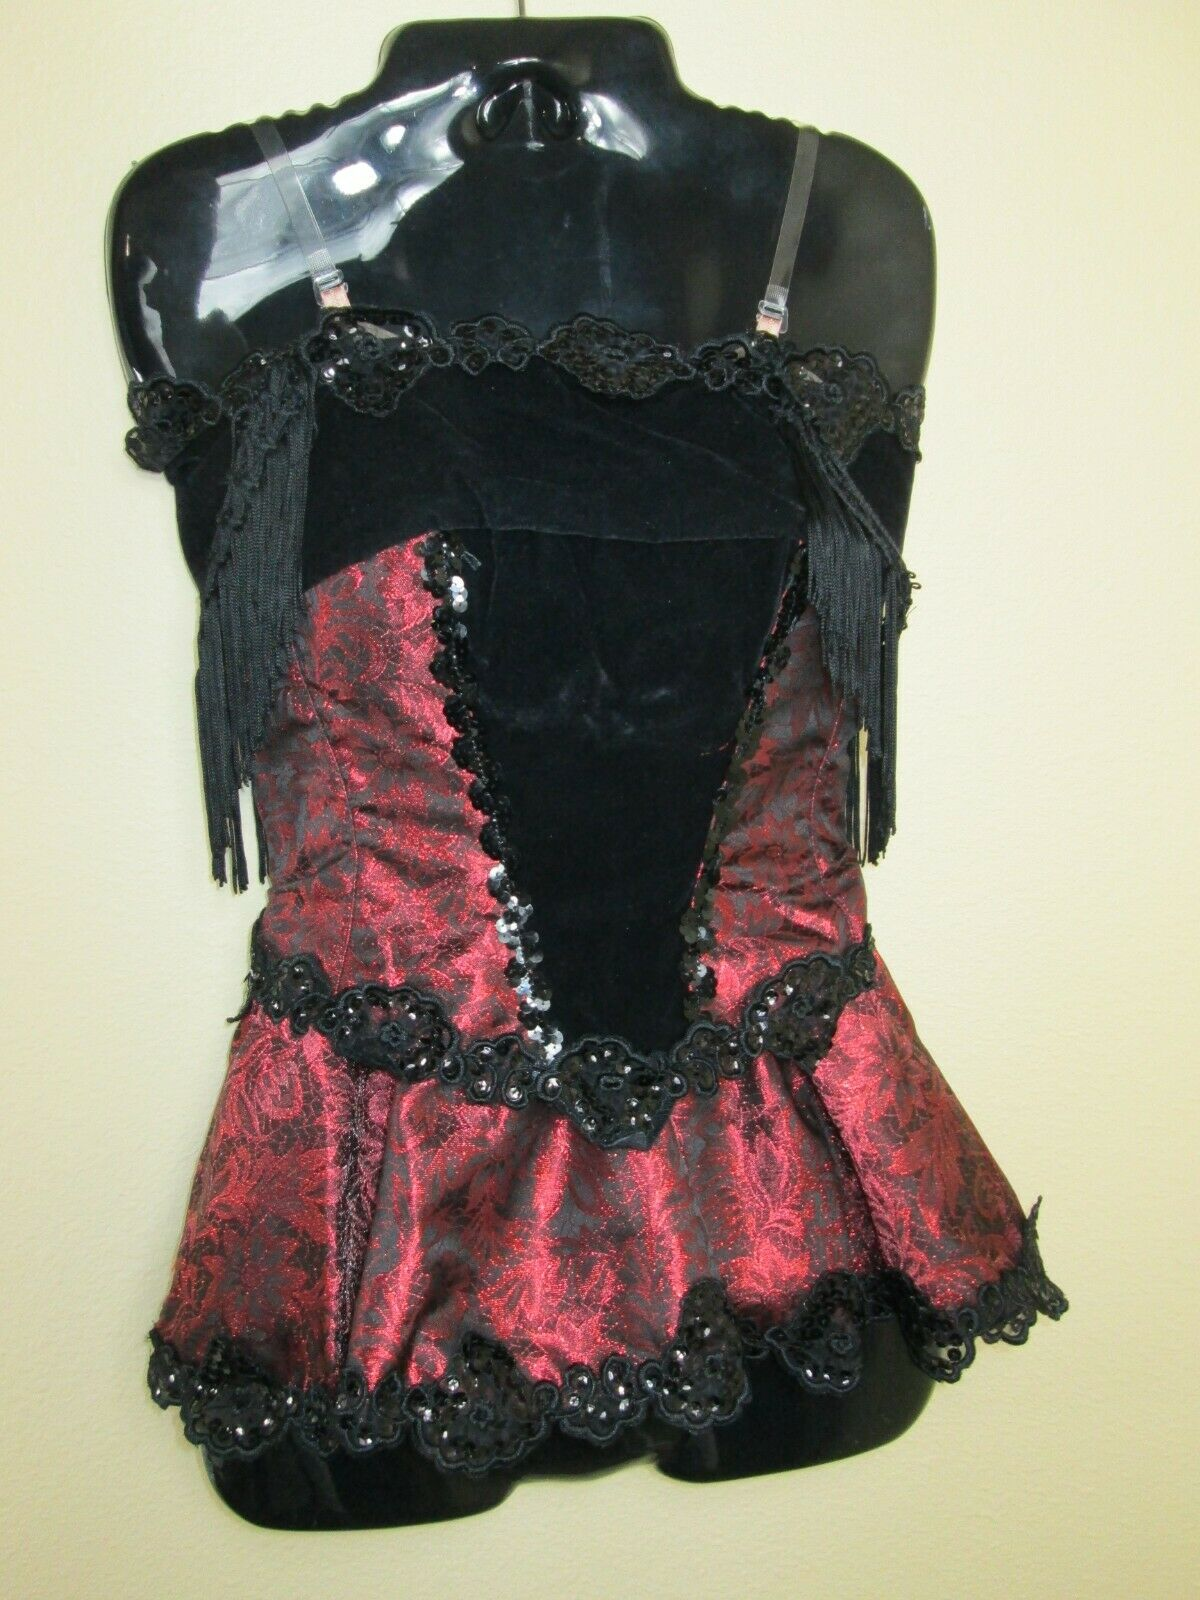 Sexy Outfit Women's Dance Wear Saloon Girl Halloween Costume Maroon Black Small